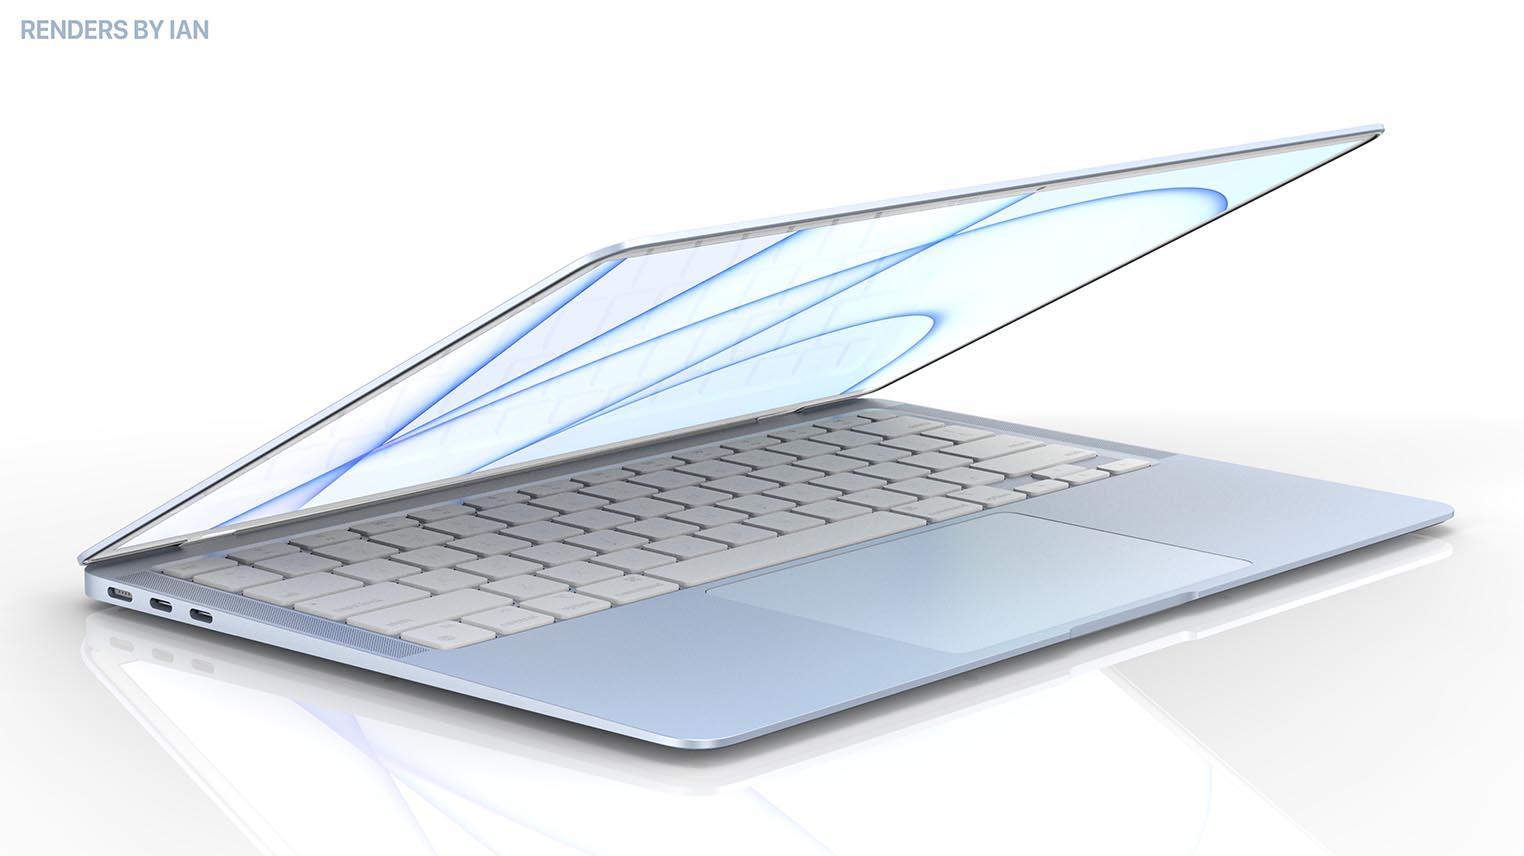 Concept MacBook Air